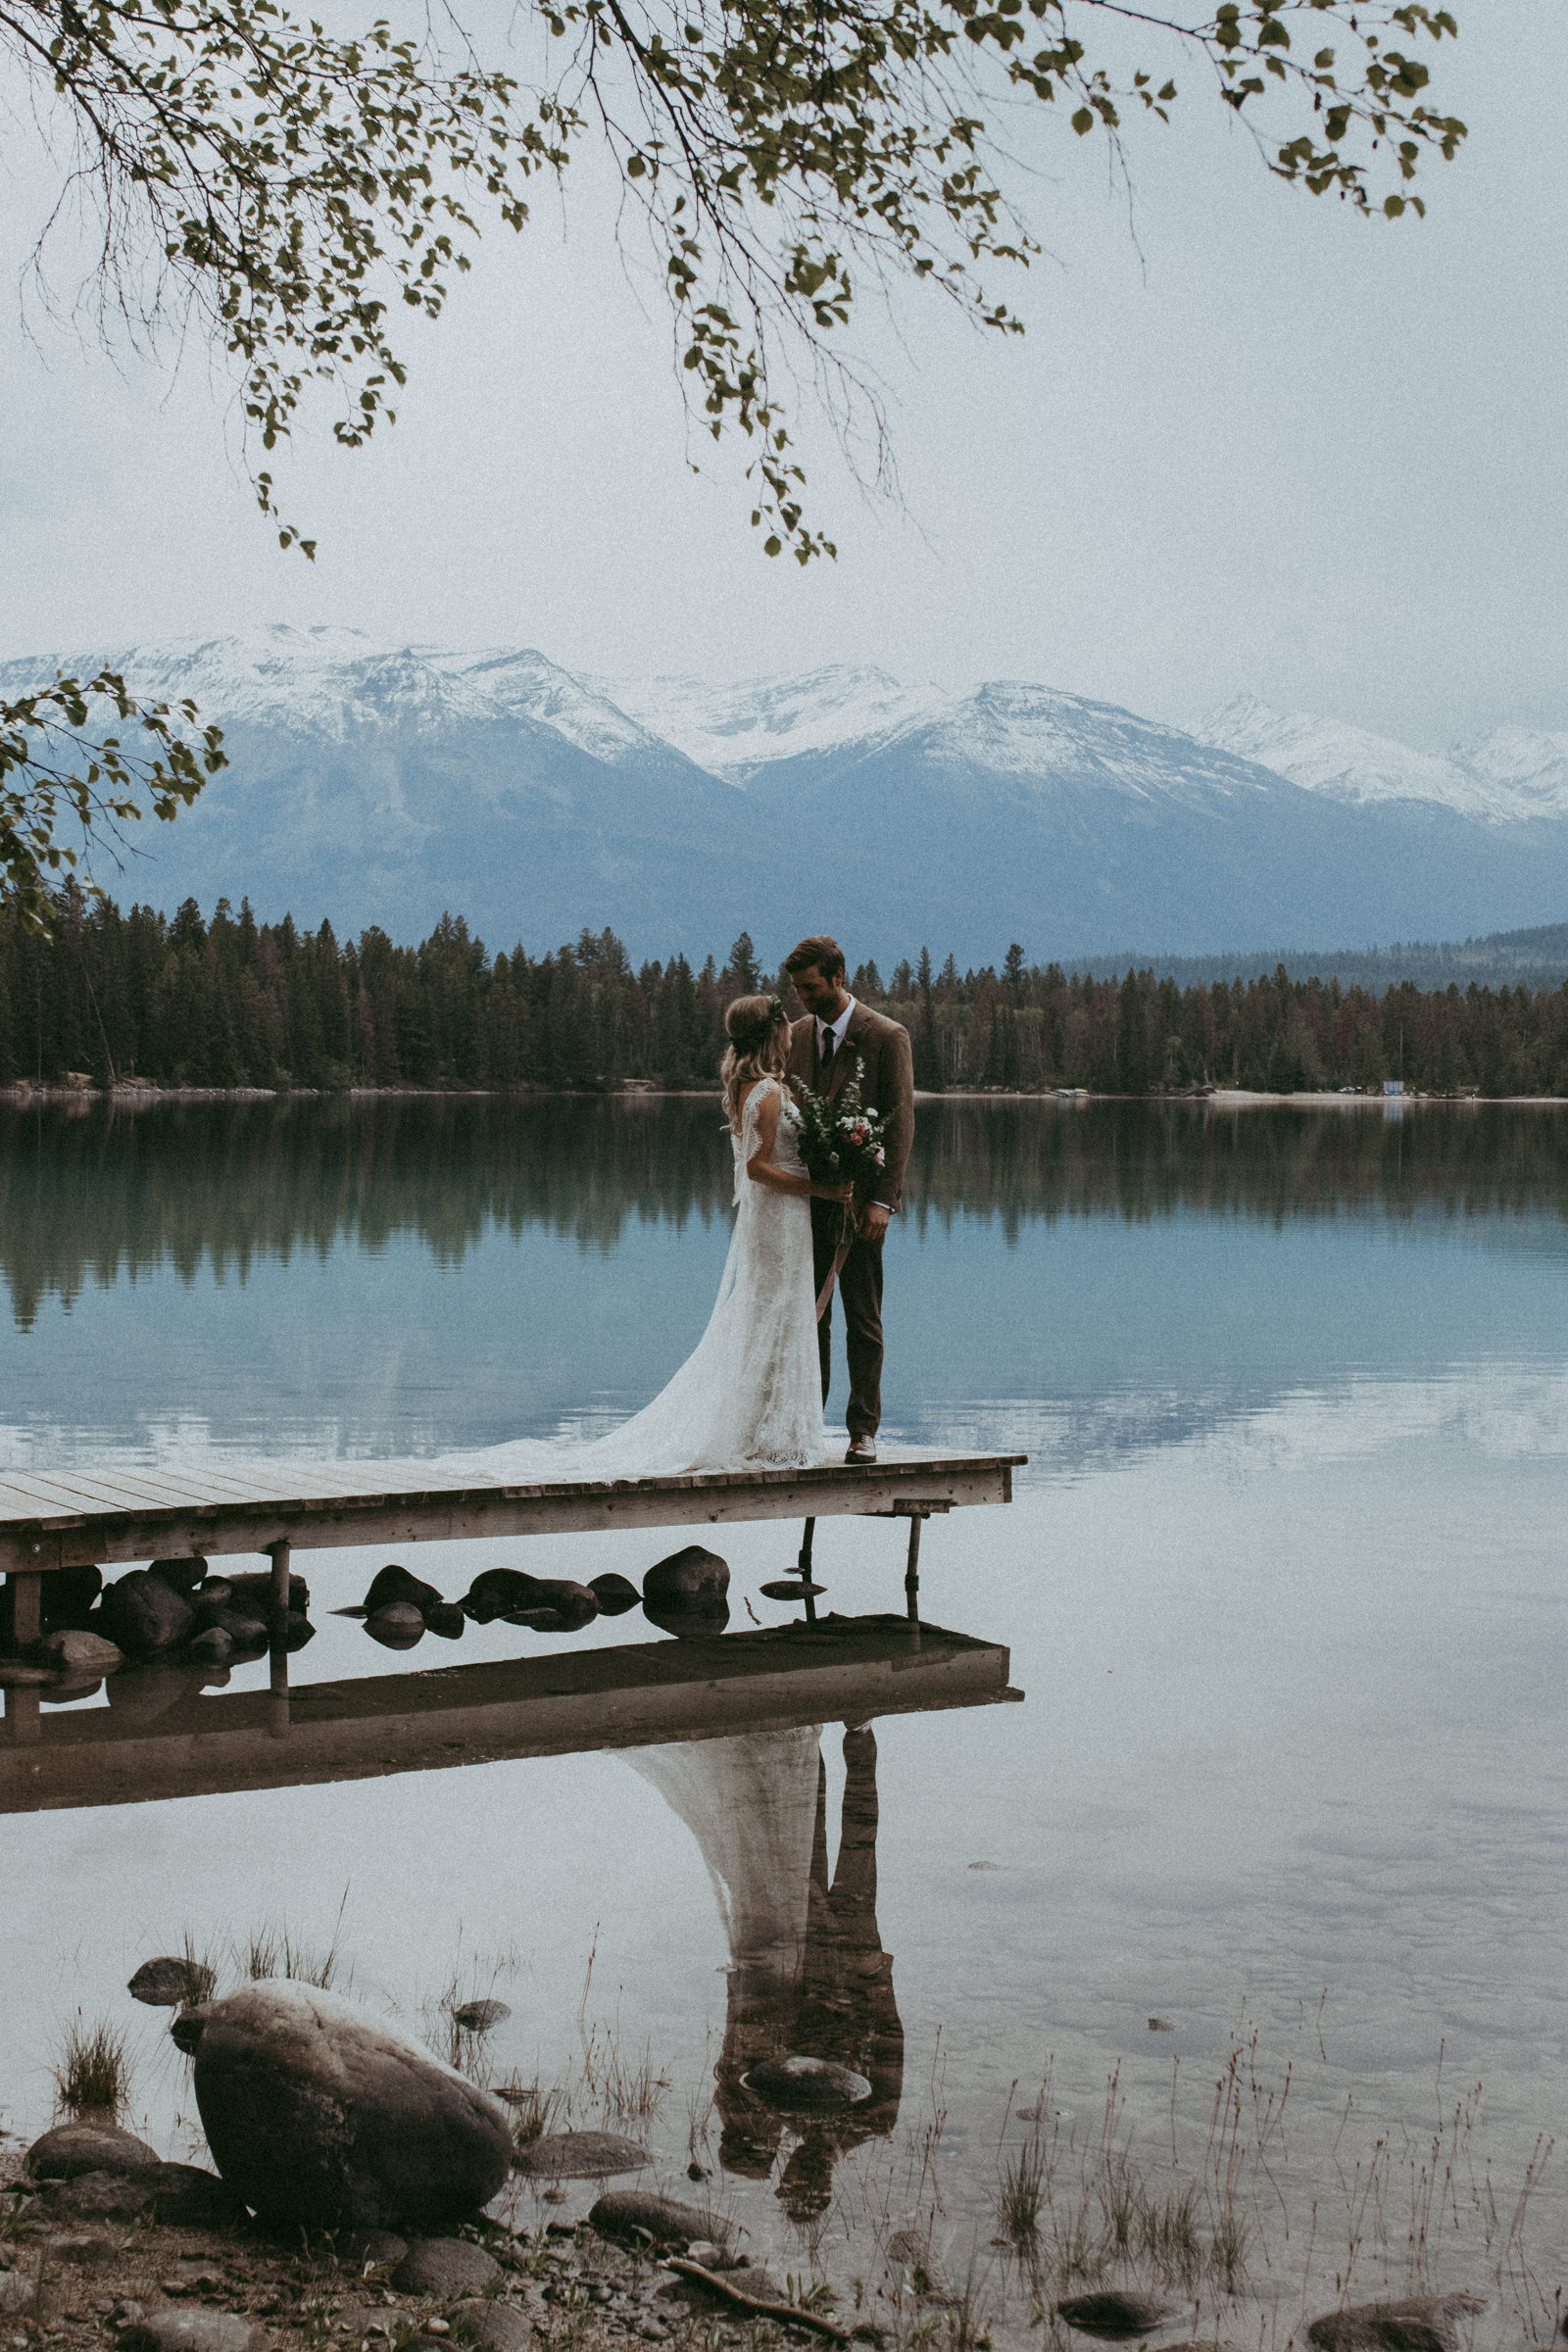 19-06-22 - Rebecca & Aaron - Jasper Wedding - Rocky Mountain Wedding-42.jpg